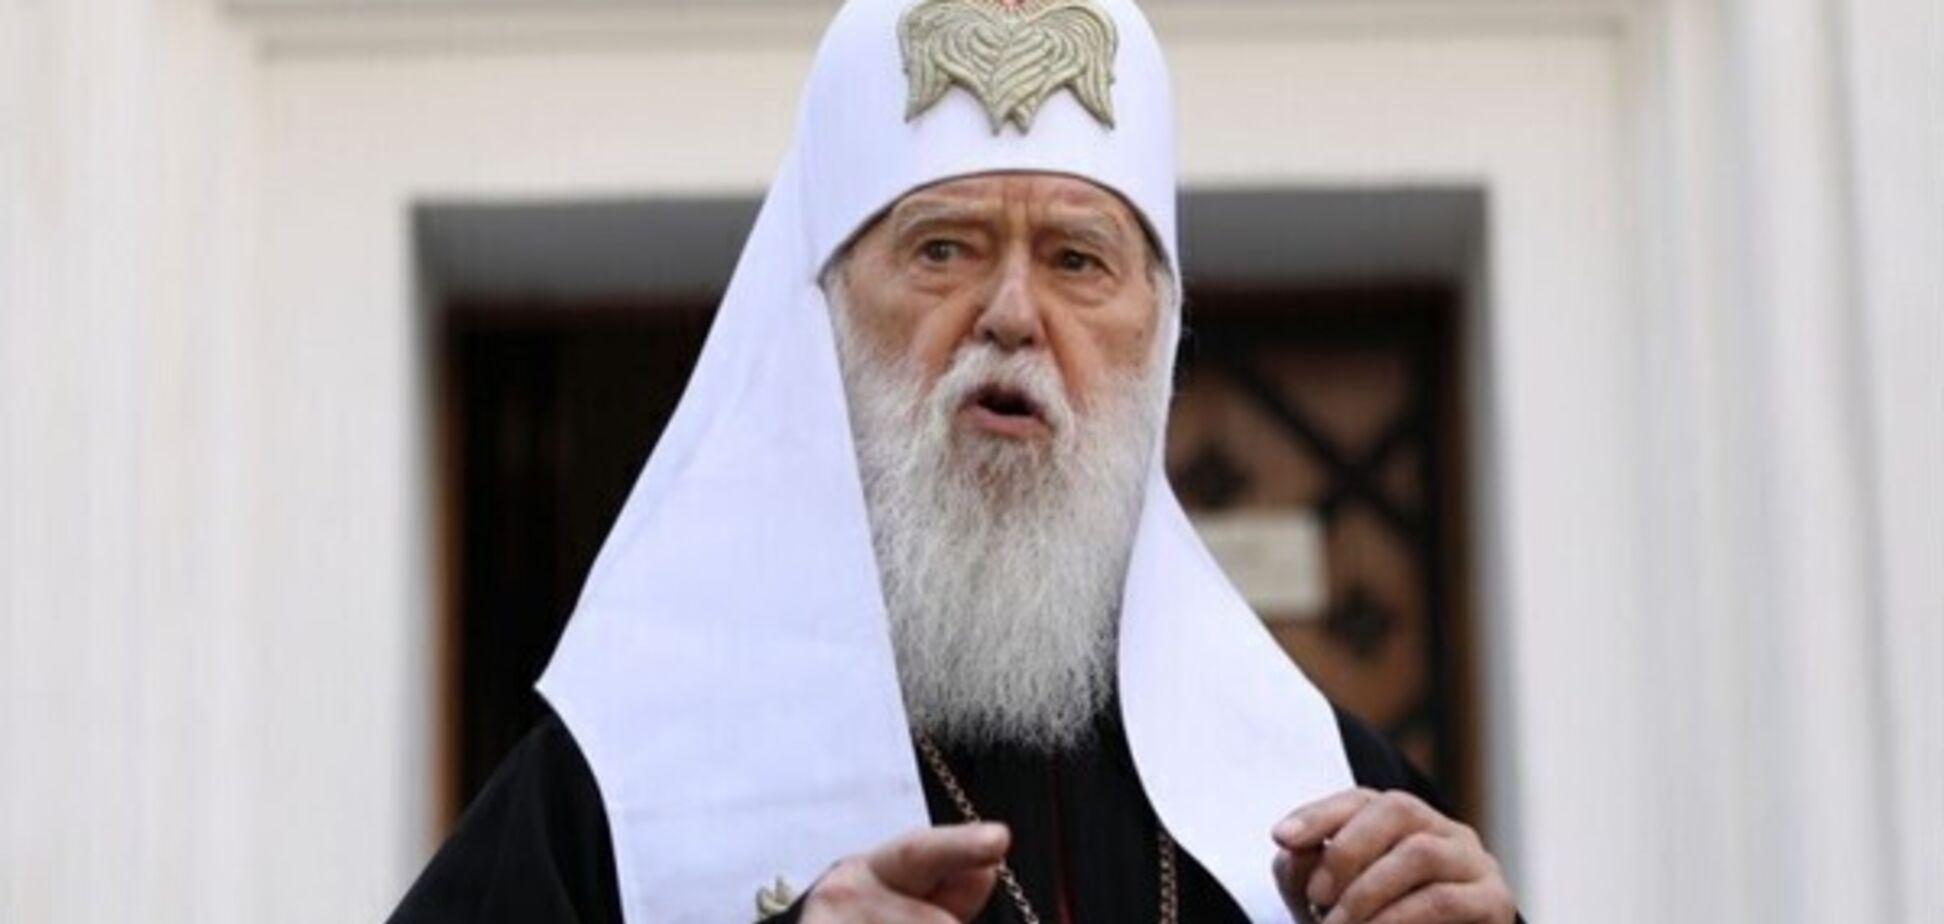 ПЦУ жорстко покарала Філарета за УПЦ КП